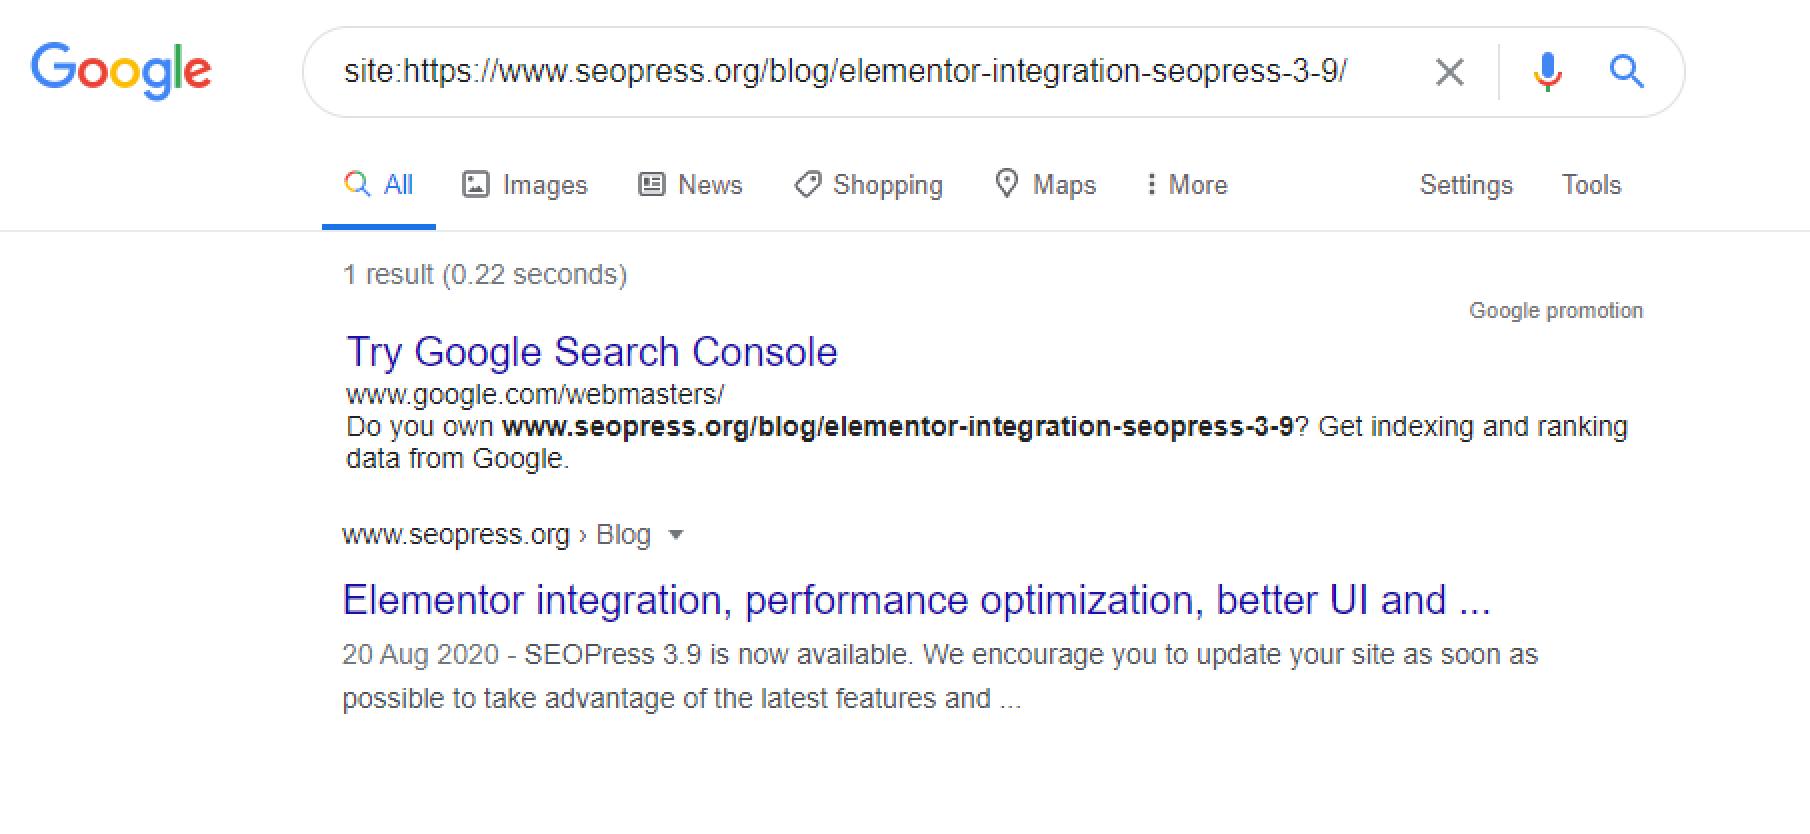 Search on Google using site:https://www.seopress.org/blog/elementor-integration-seopress-3-9/